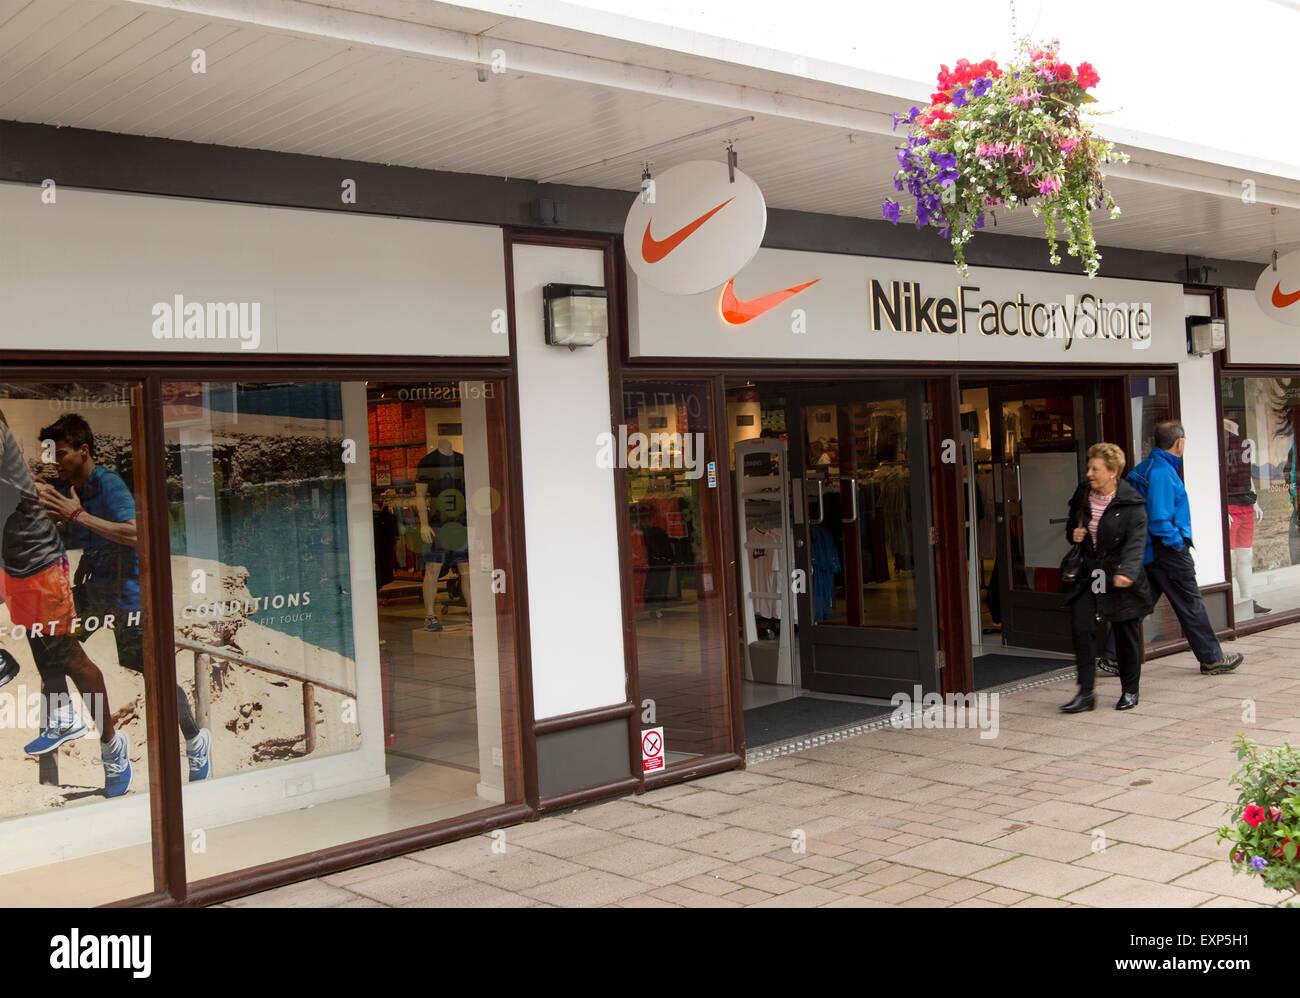 Nike Factory Store, Festival Park shopping centre, Ebbw Vale, Blaenau  Gwent, South Wales, UK